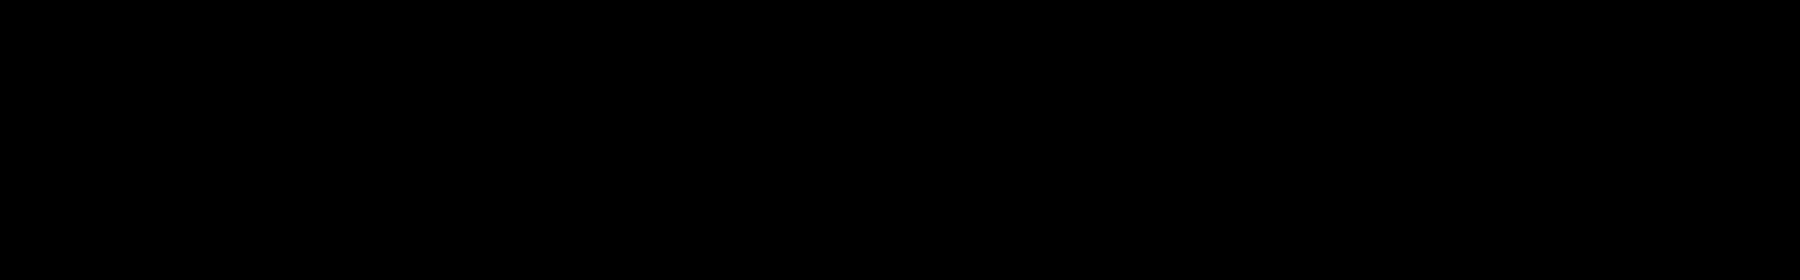 Drillmatic audio waveform